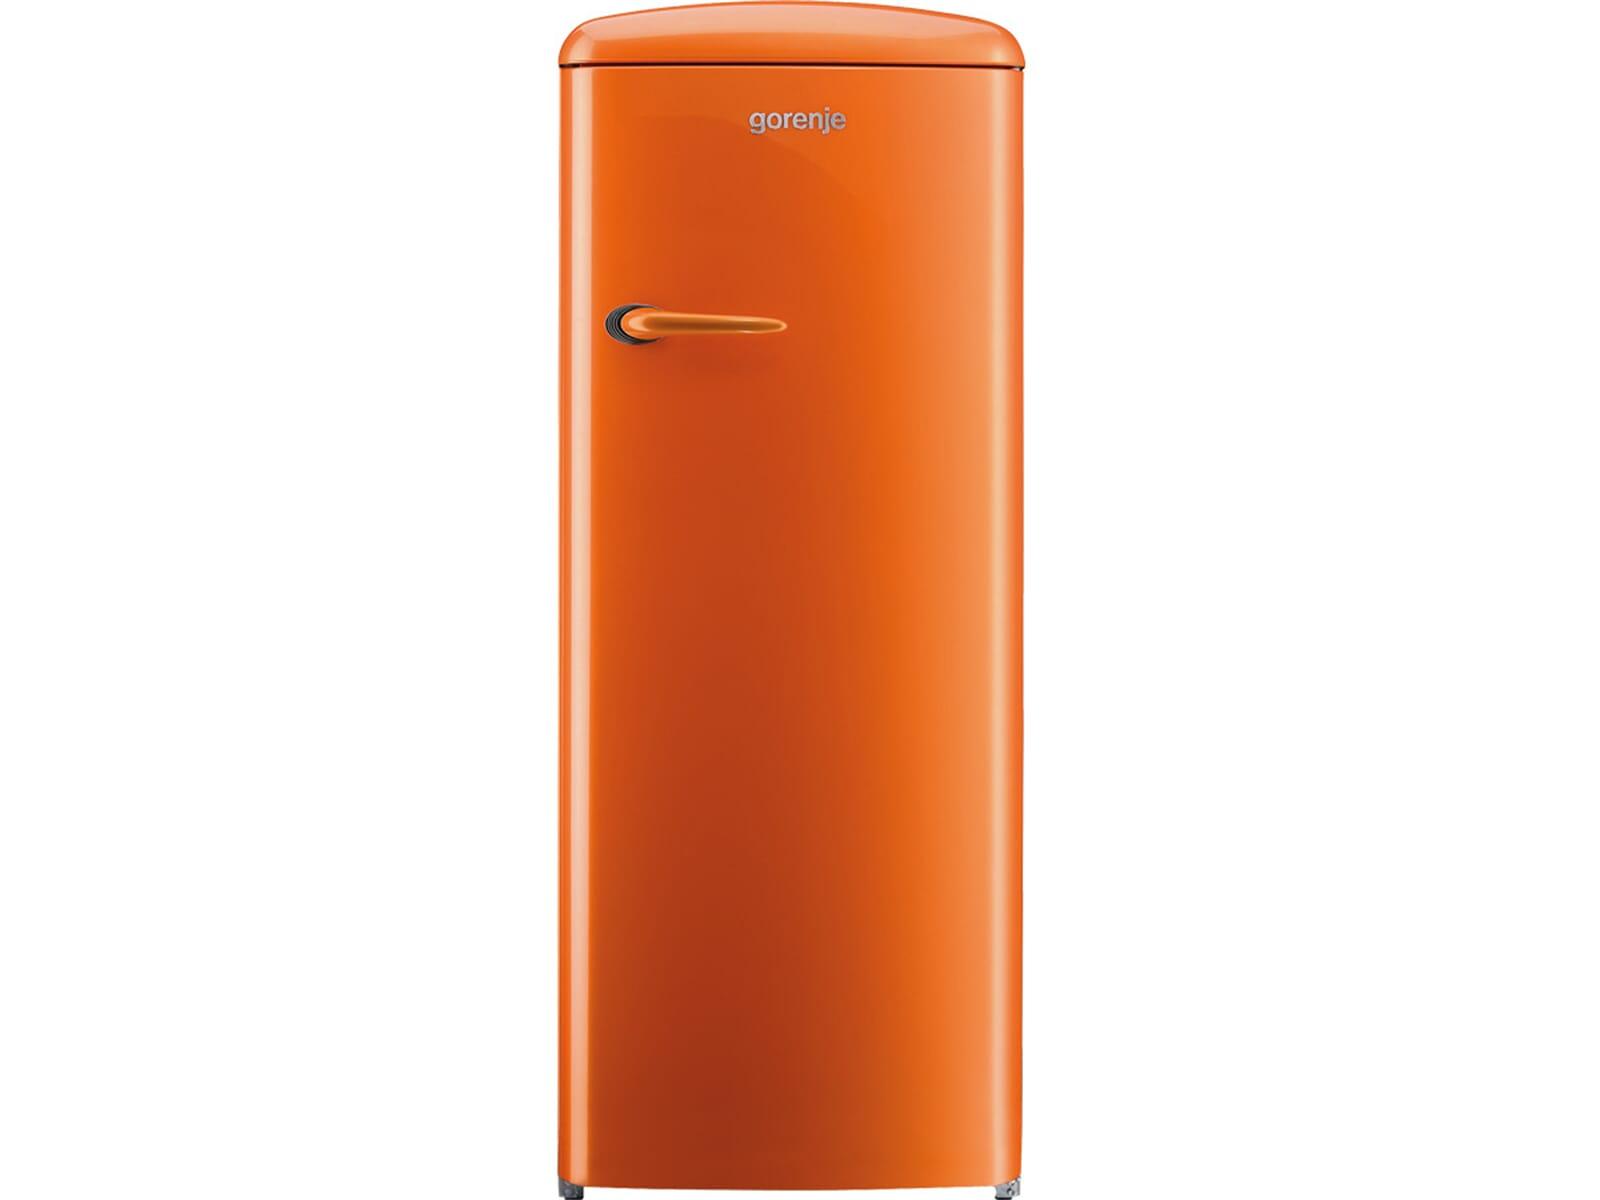 Gorenje Retro Kühlschrank Orange : Gorenje retro kühlschrank orange gorenje rb och l